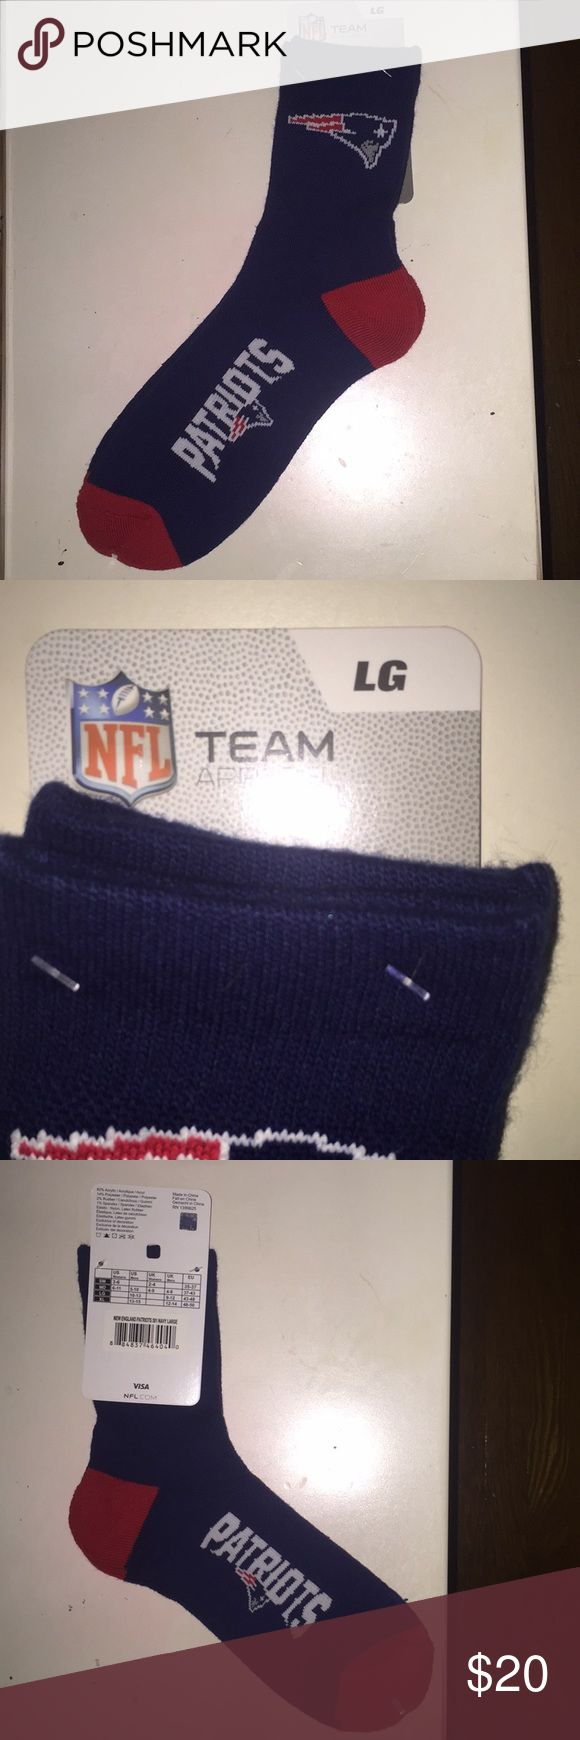 NWT PATRIOTS SOCKS New patriots socks bought from the NFL store. Very comfy Underwear & Socks Casual Socks